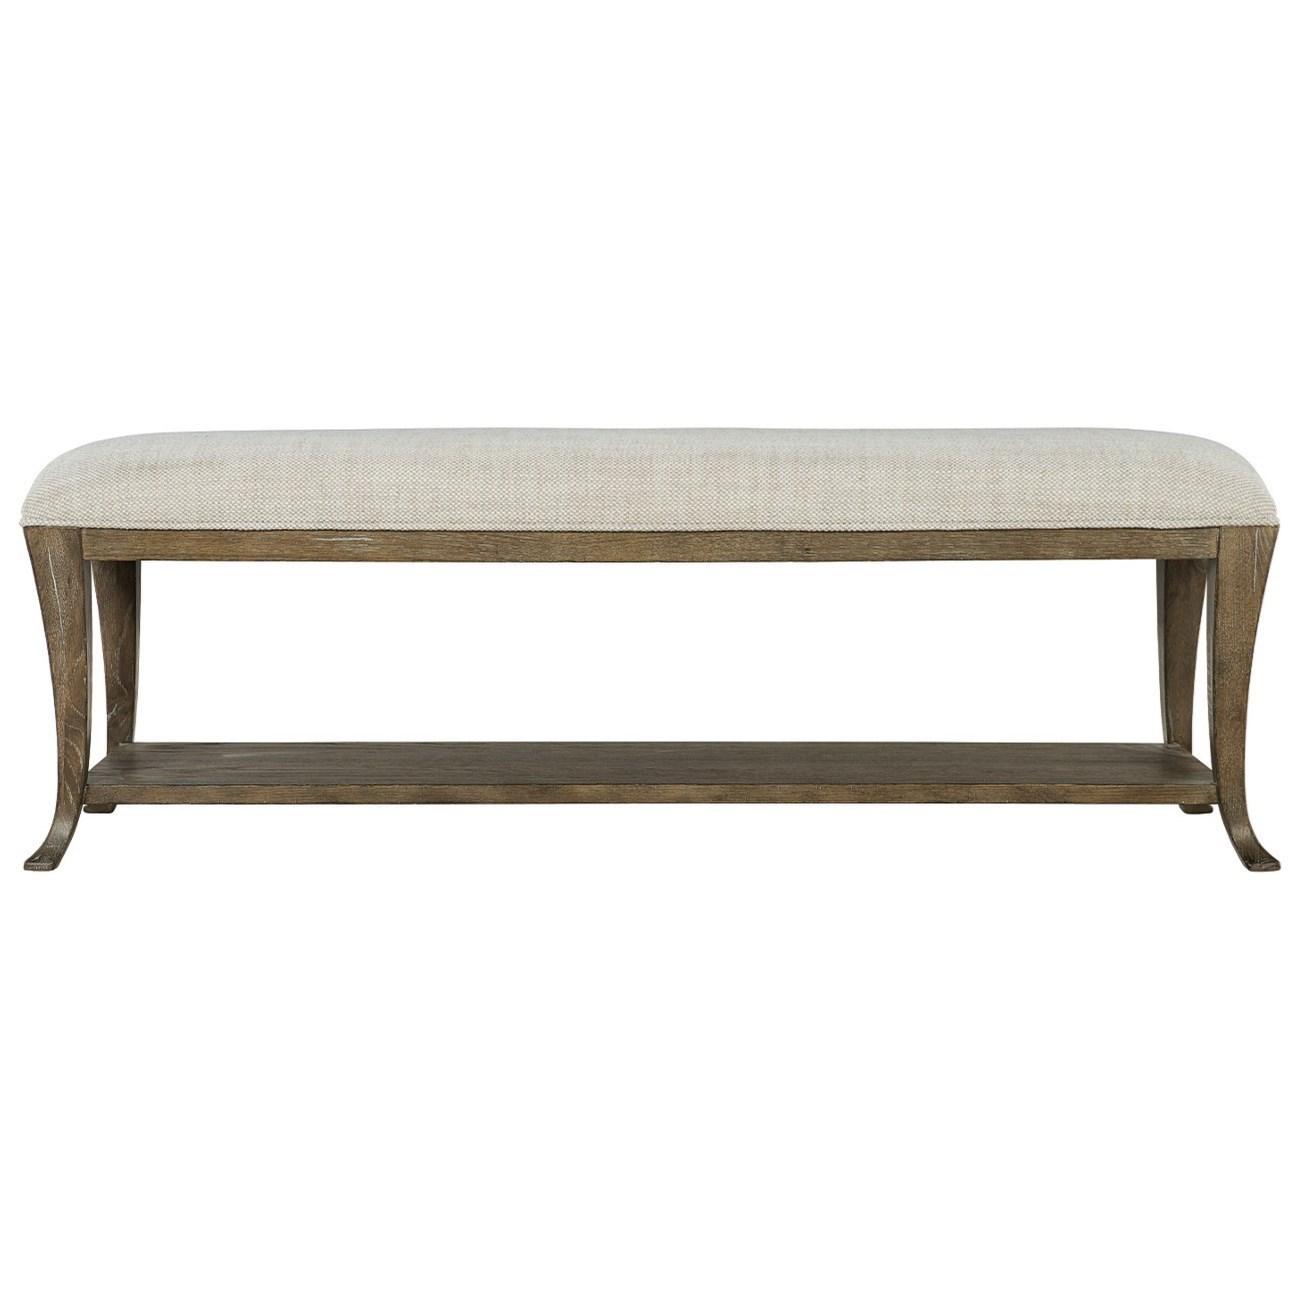 Bernhardt Rustic Patina Customizable Rustic Upholstered